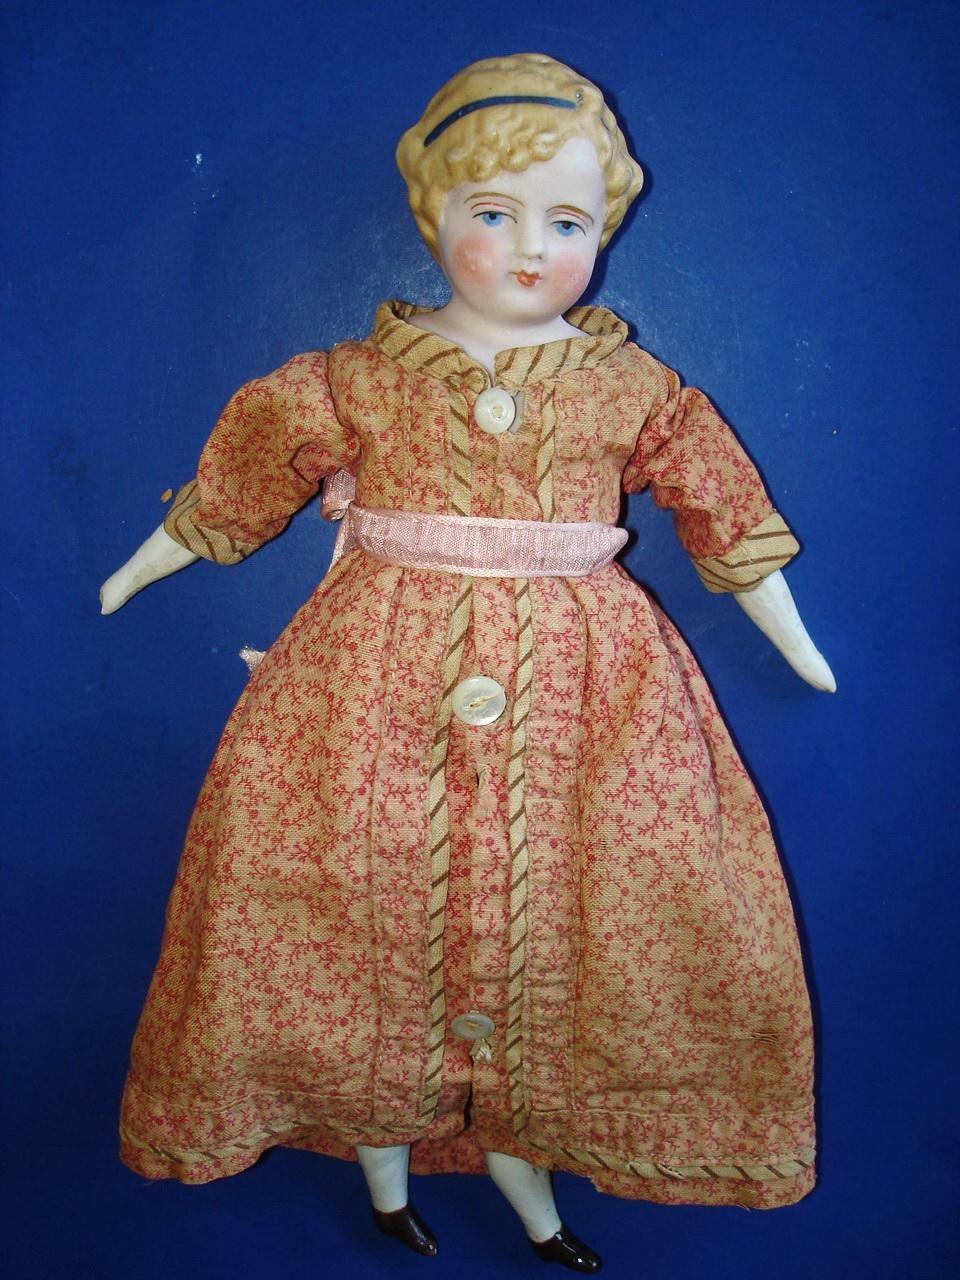 10 Simon Halbig Parian Lady Doll Germany 1869 On Alice Style